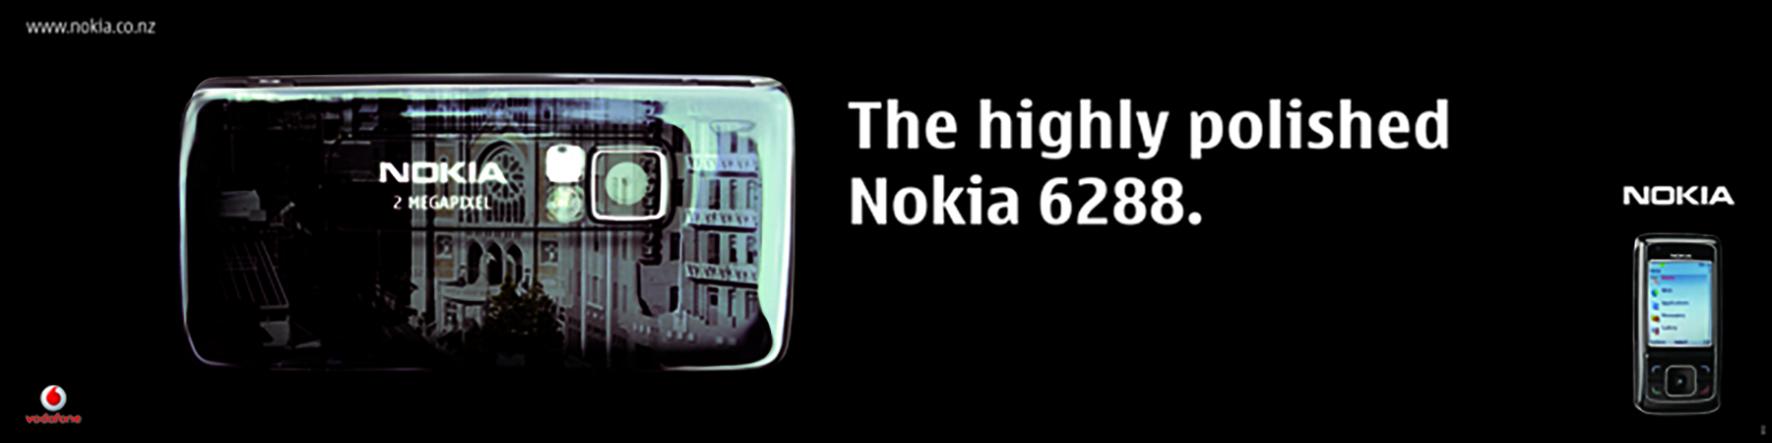 Nokia6288_Welly.jpg